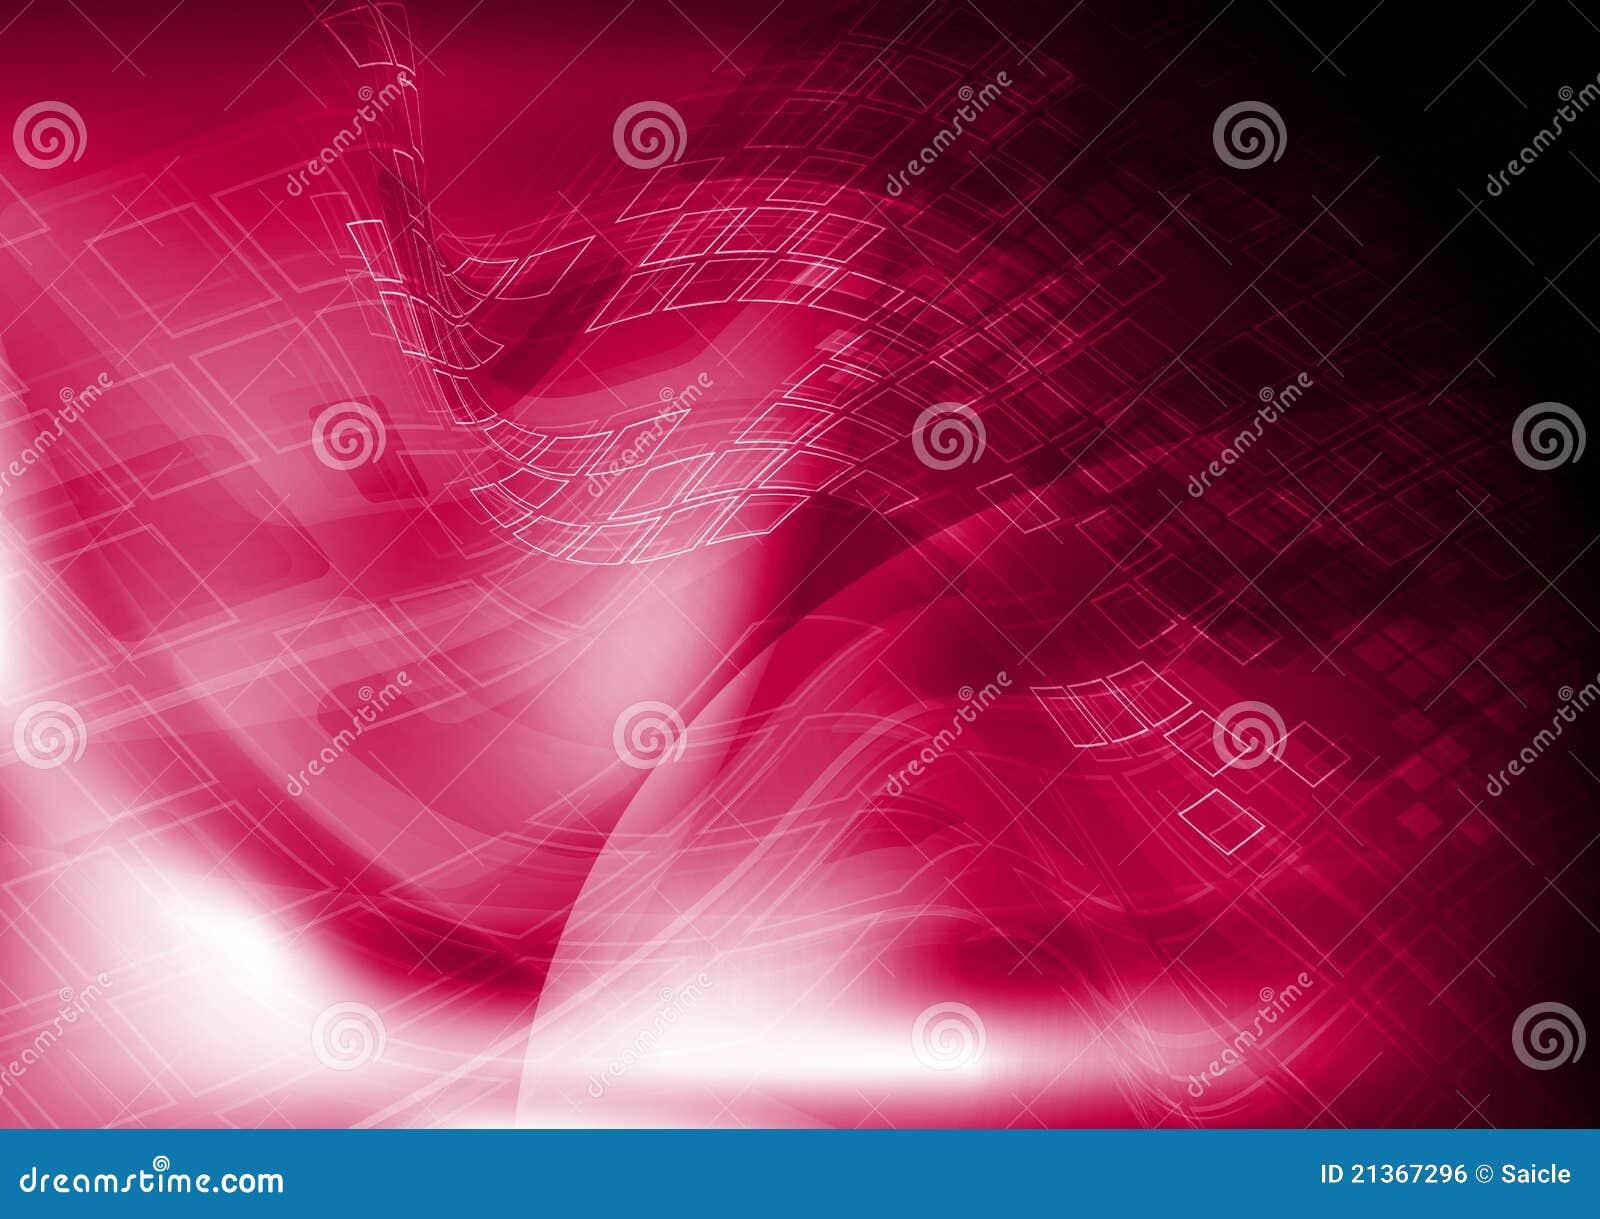 Tech Background Stock Vector  Illustration Of Digital